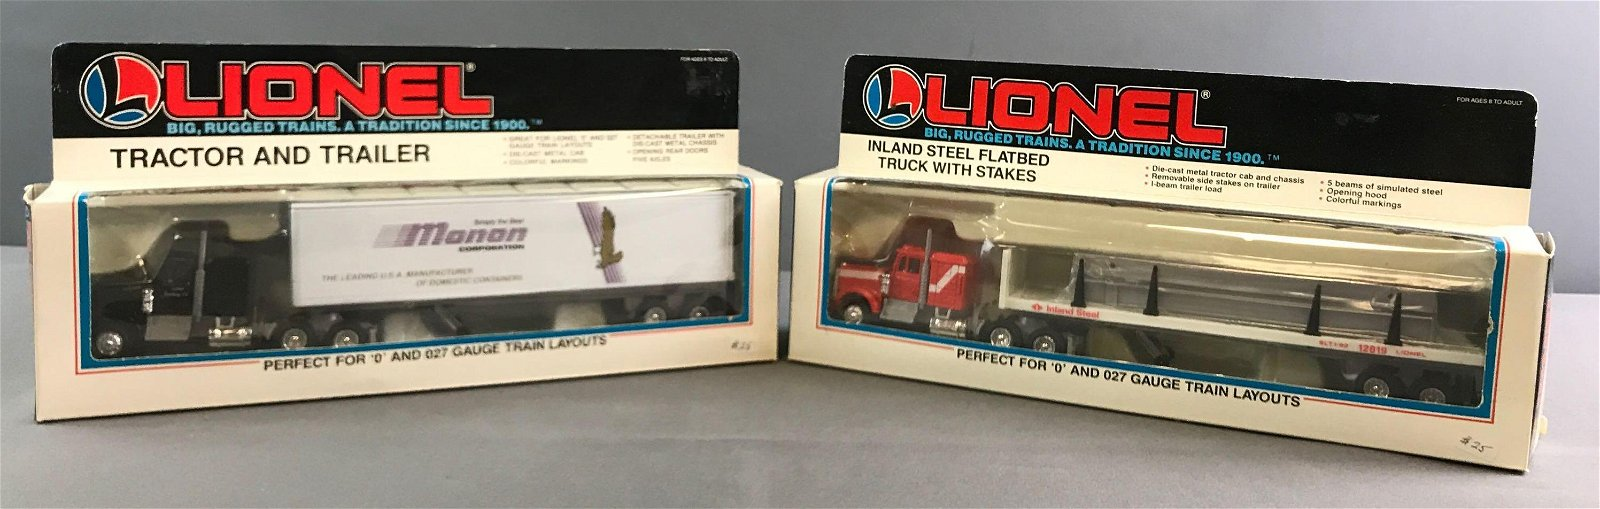 Lionel Die Cast Trucks In Original Packaging